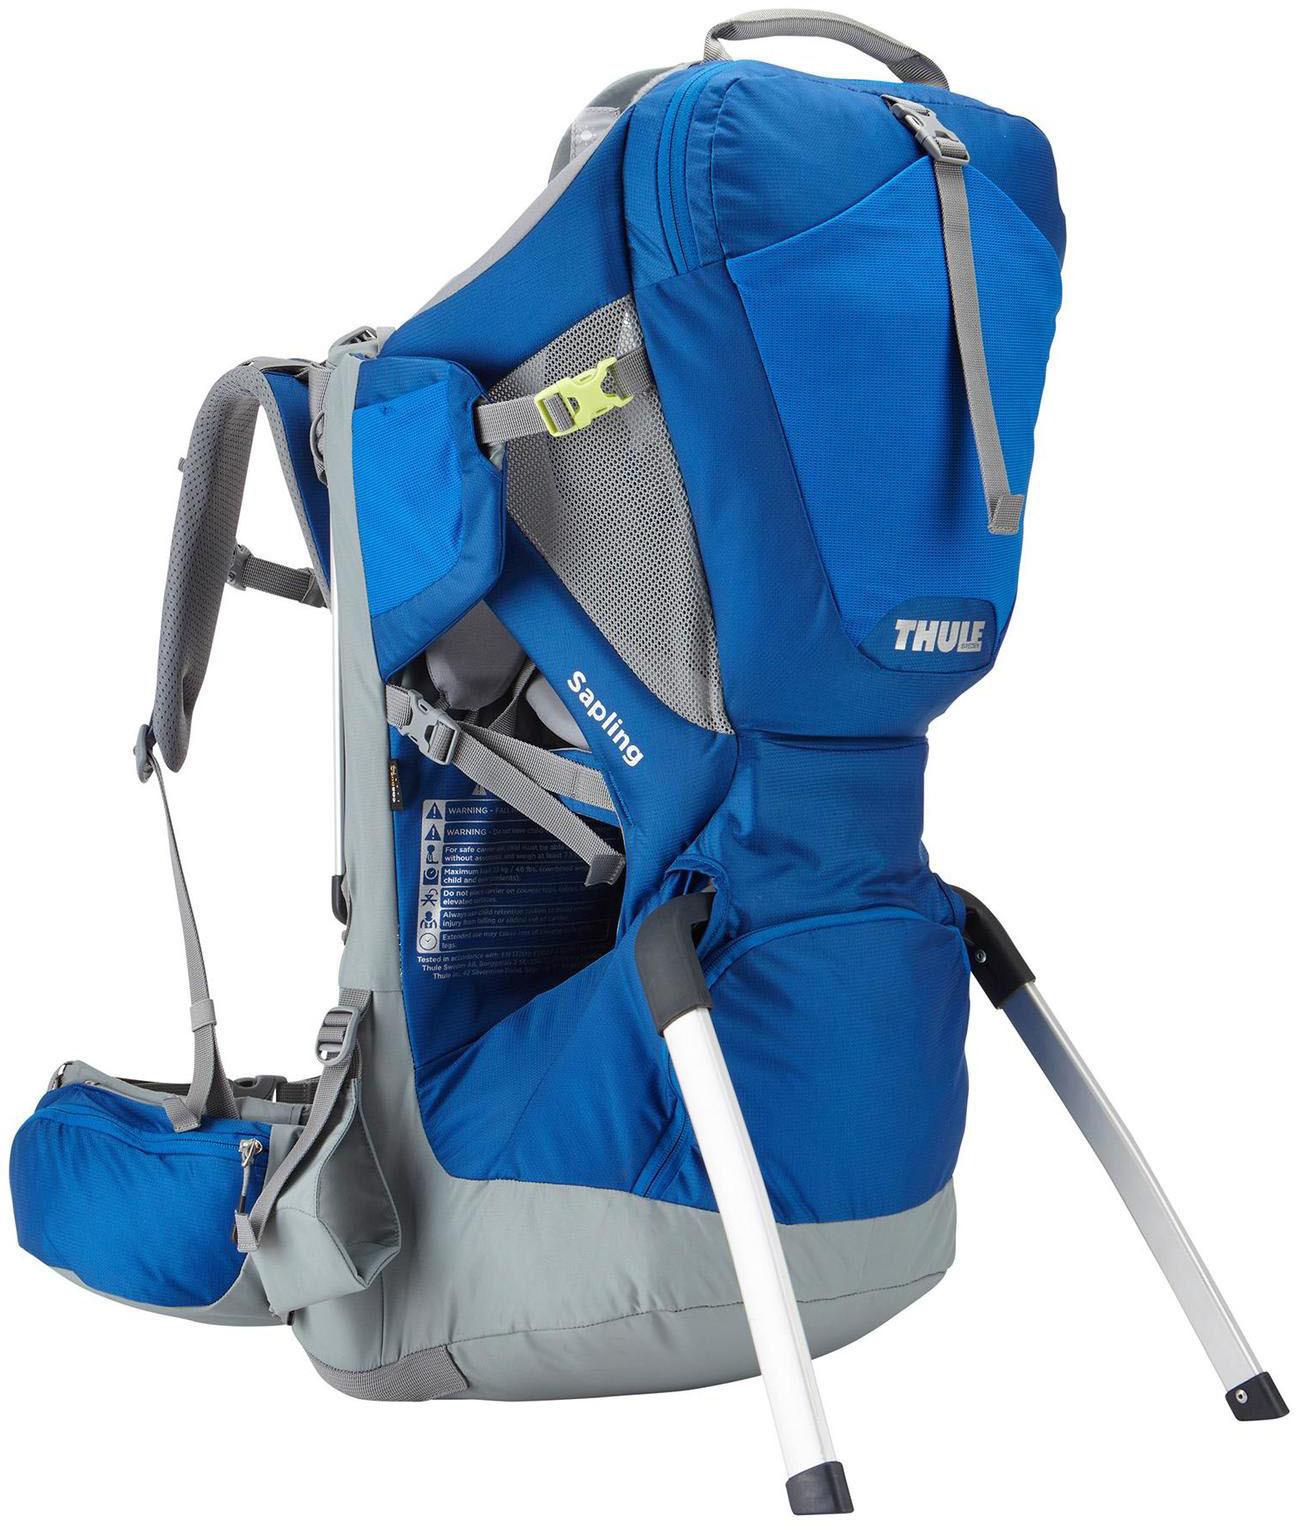 Туристические рюкзаки Thule Рюкзак-переноска Thule Sapling Child Carrier 210205.jpg